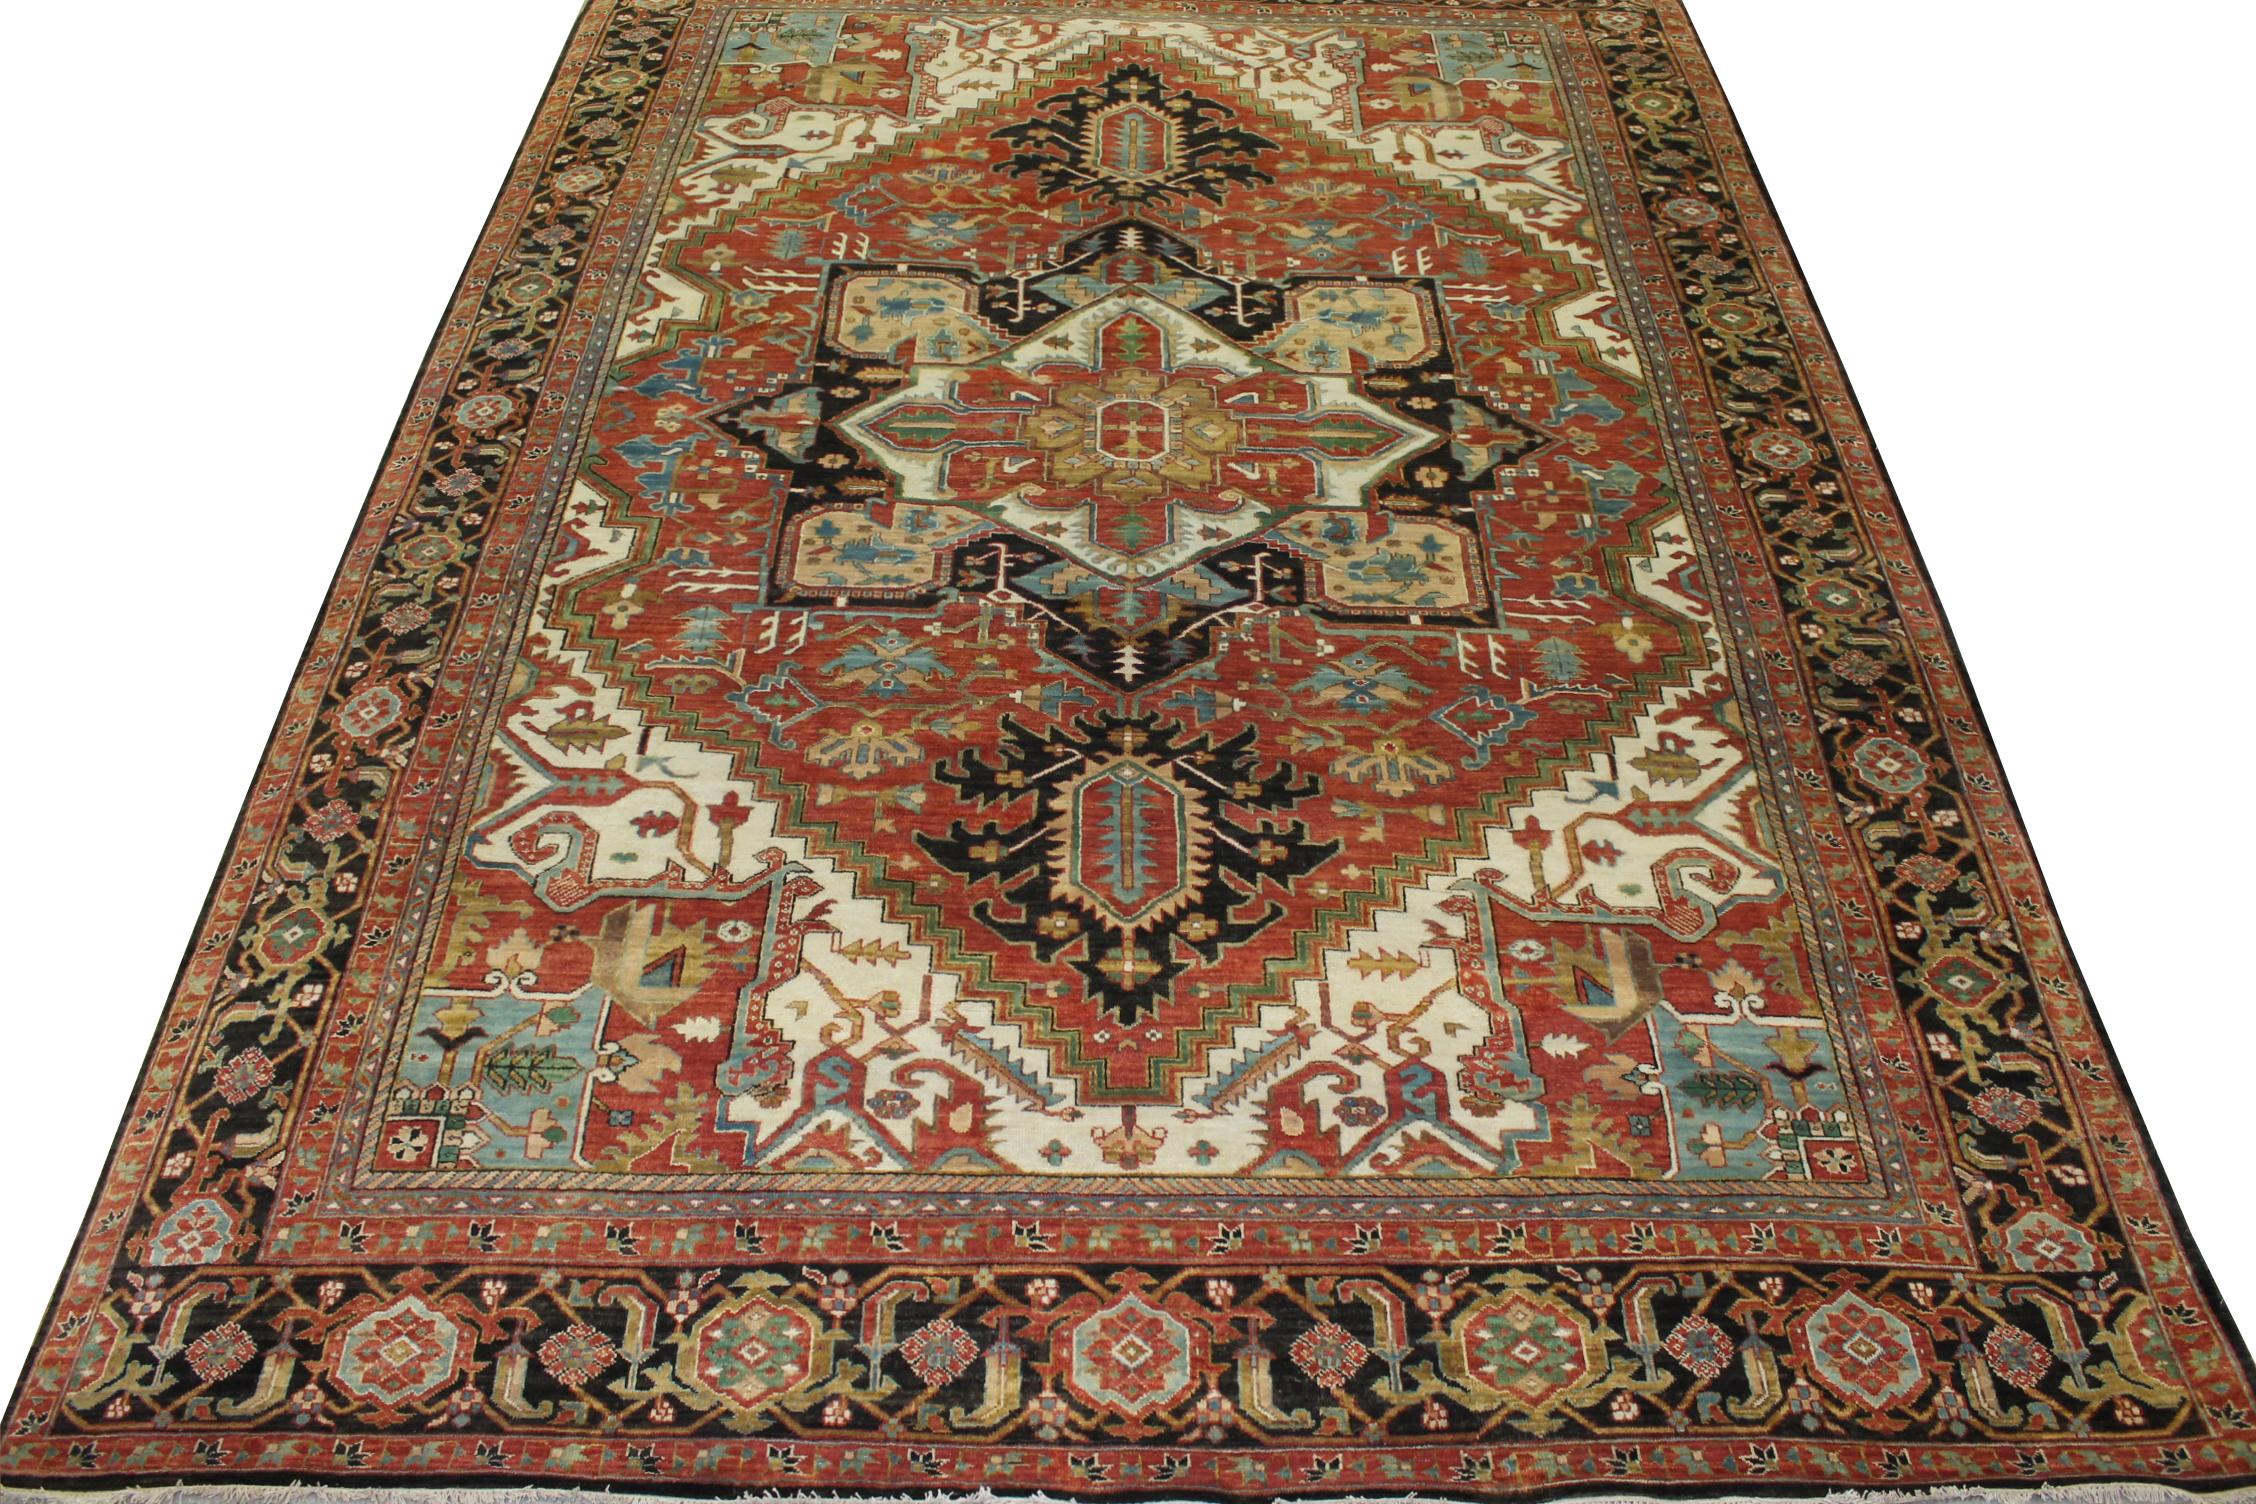 10x14 Heriz/Serapi Hand Knotted Wool Area Rug - MR023760